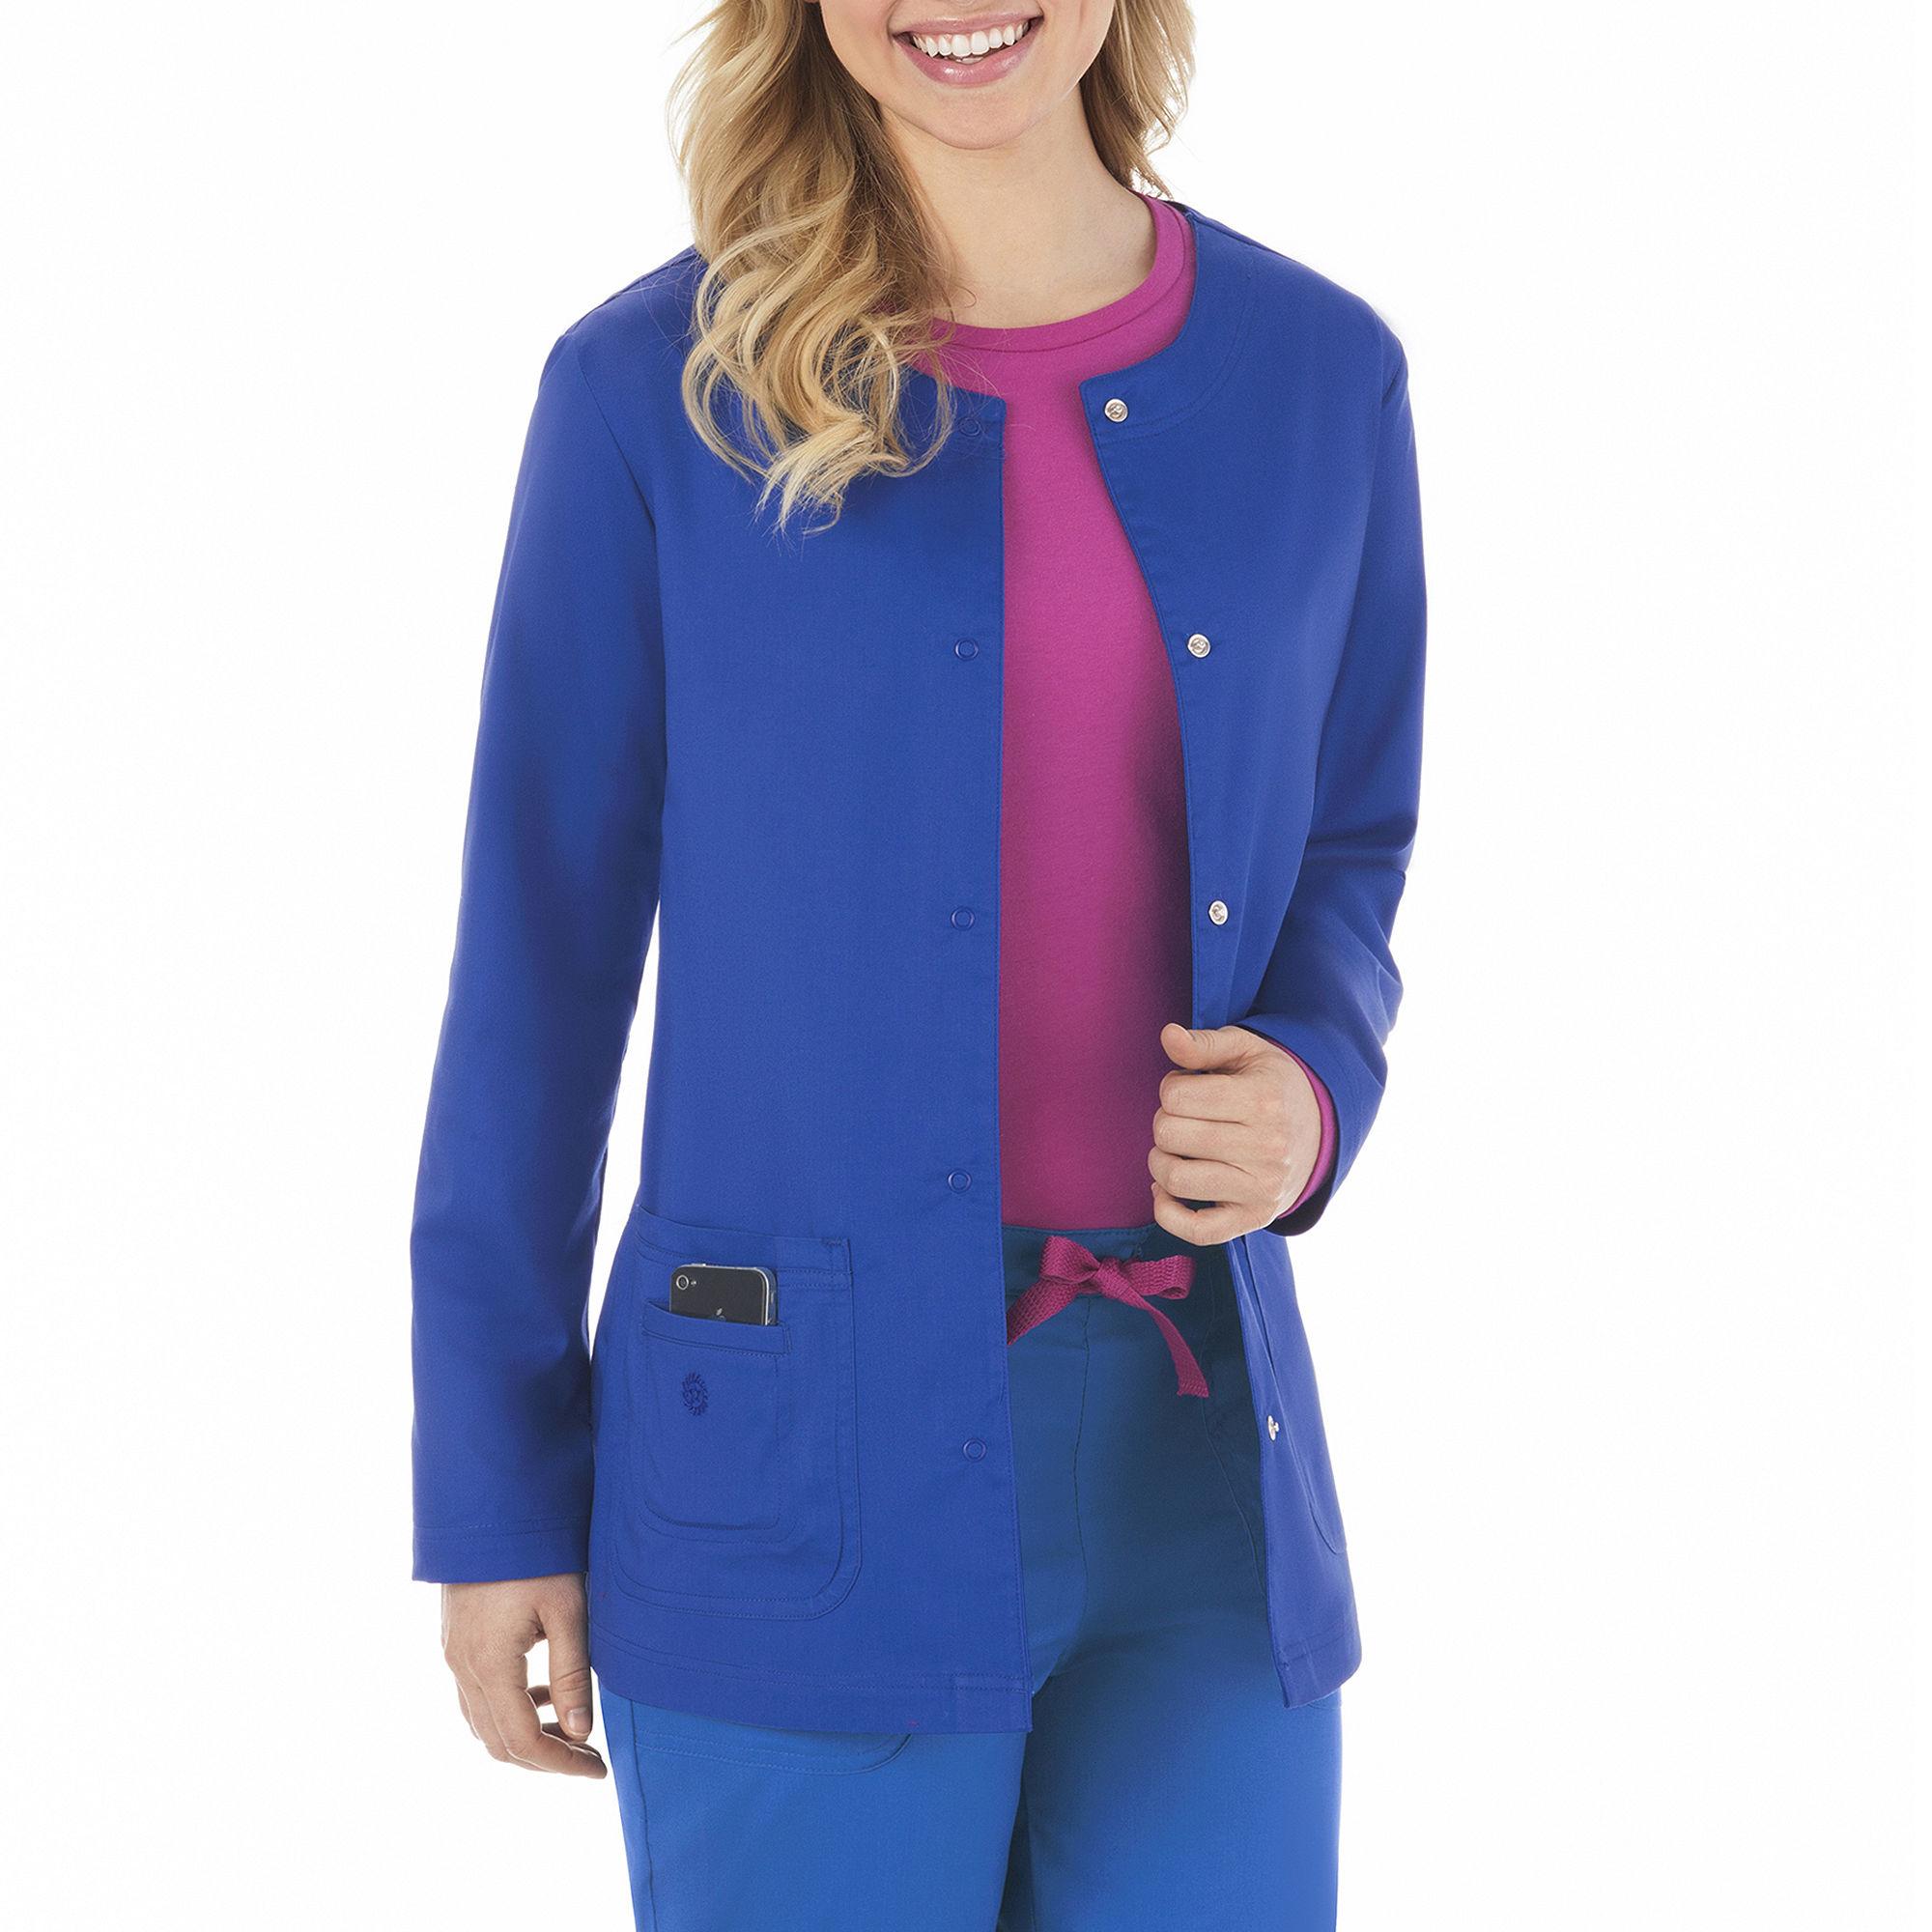 Bio Stretch Ladies Everyday Warm-Up Jacket - Plus